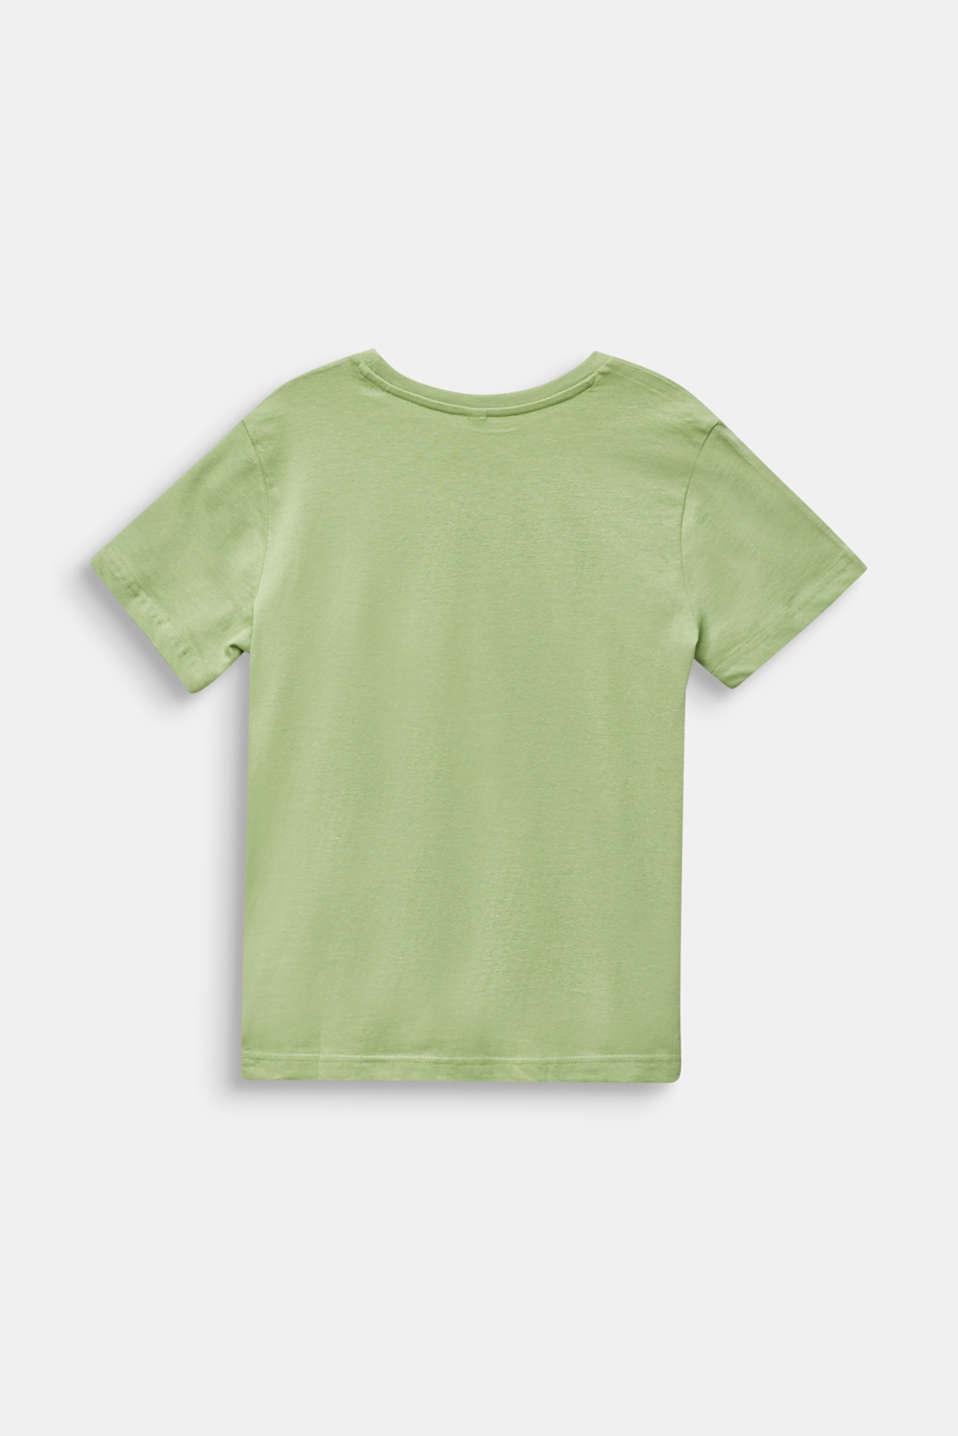 Statement T-shirt, 100% cotton, LCPASTEL GREEN, detail image number 1